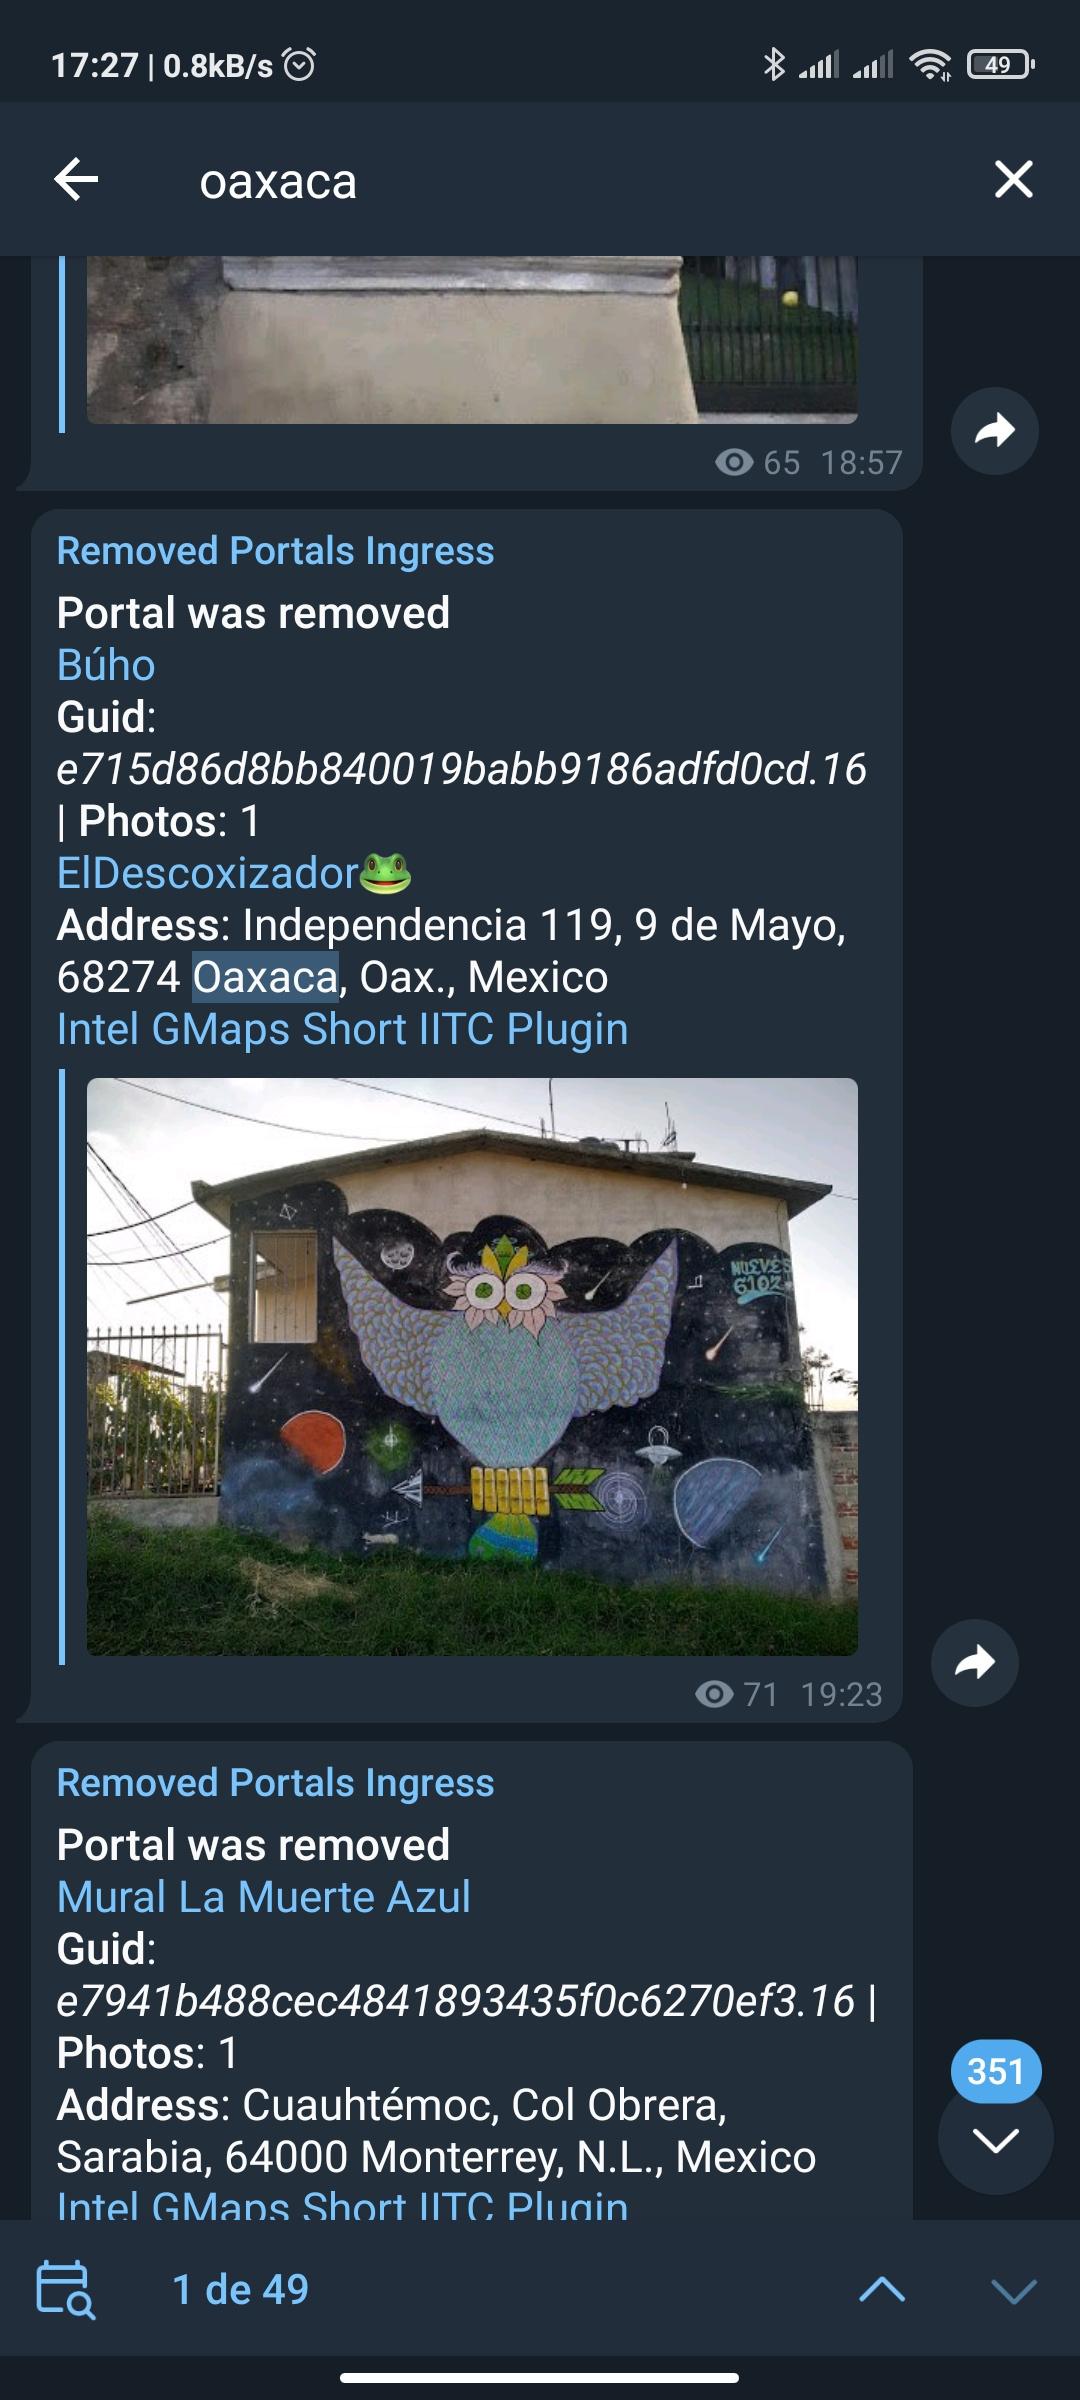 Screenshot_2021-02-08-17-27-13-450_org.telegram.messenger.jpg